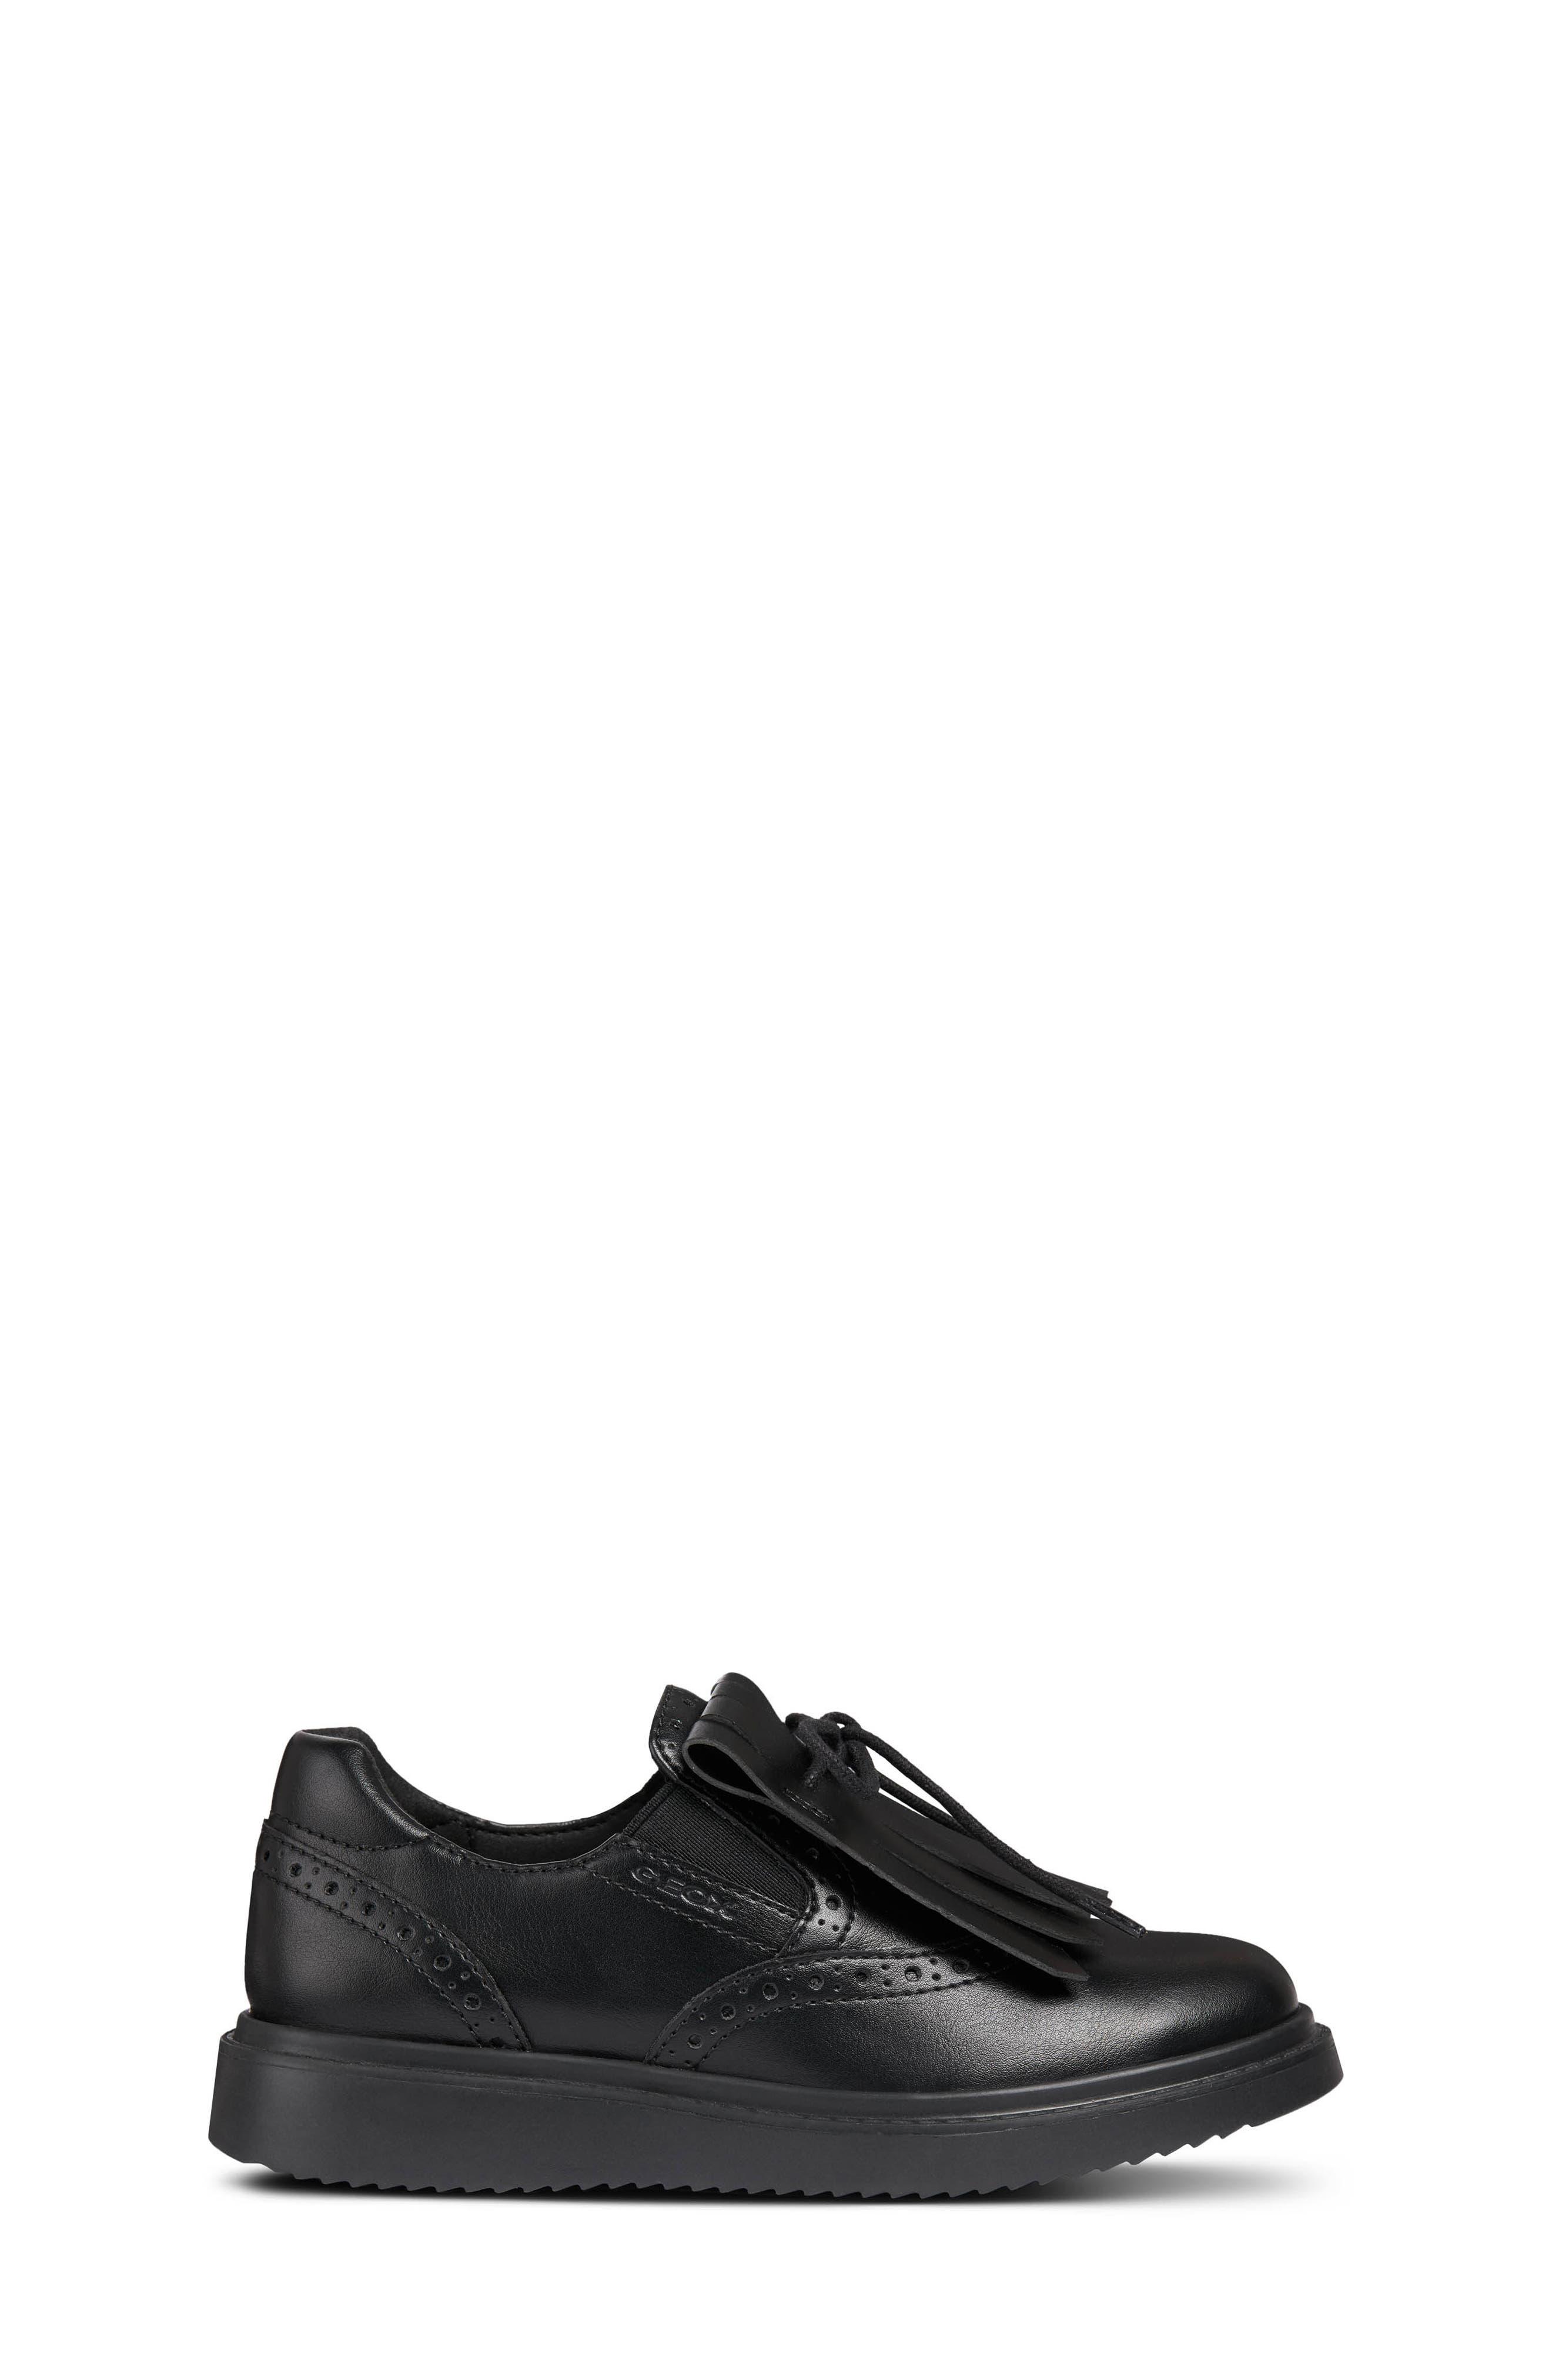 GEOX,                             Thymar Kiltie Fringe Sneaker,                             Alternate thumbnail 3, color,                             001